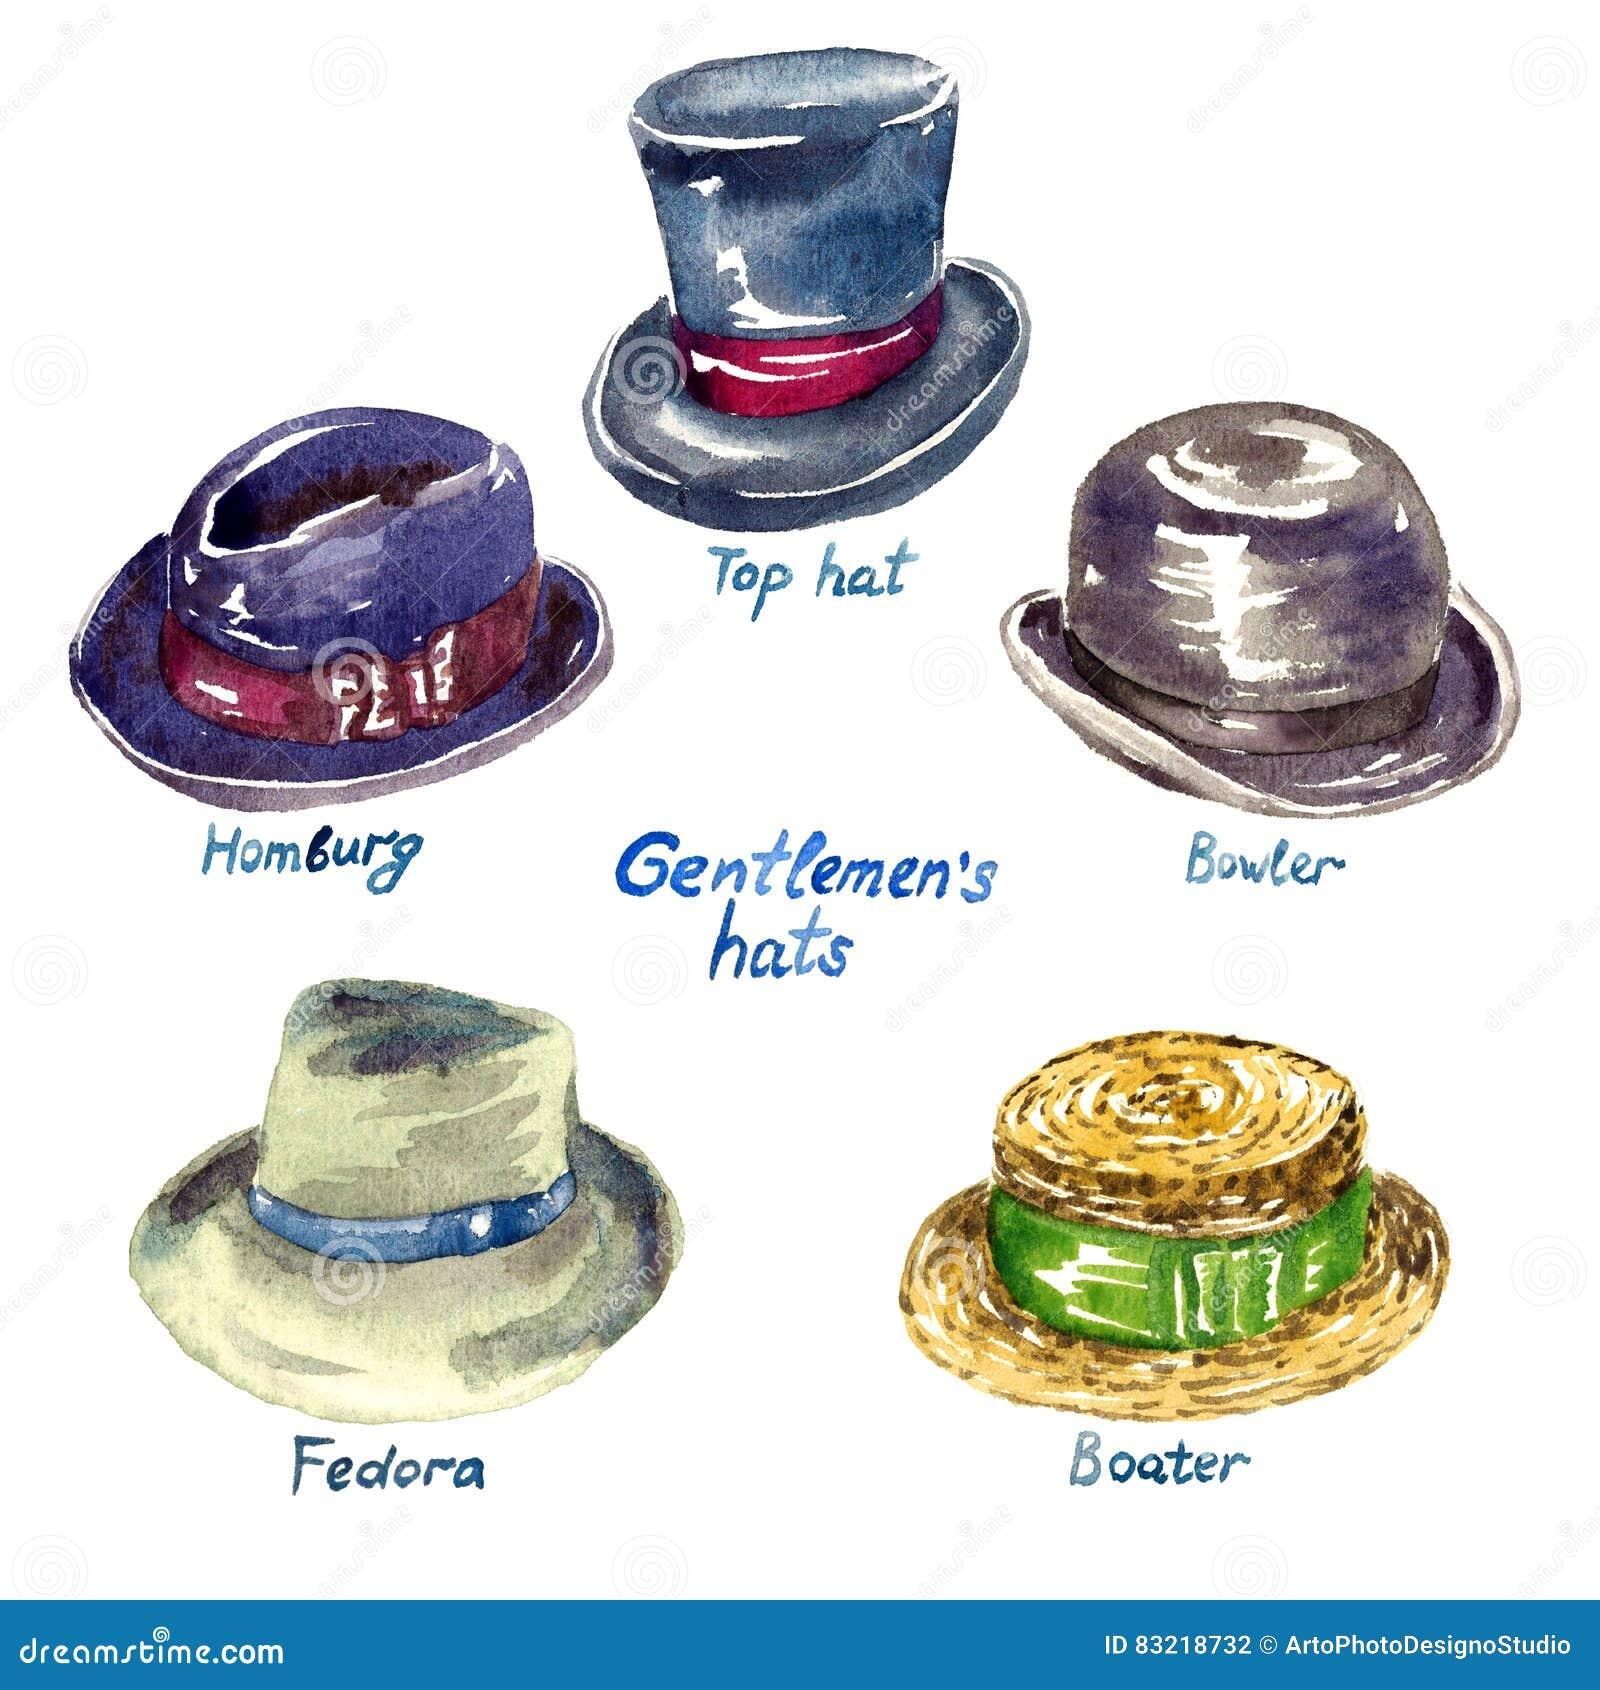 b087d716247a9 Gentlemen`s hats types stock illustration. Illustration of gentlemen ...